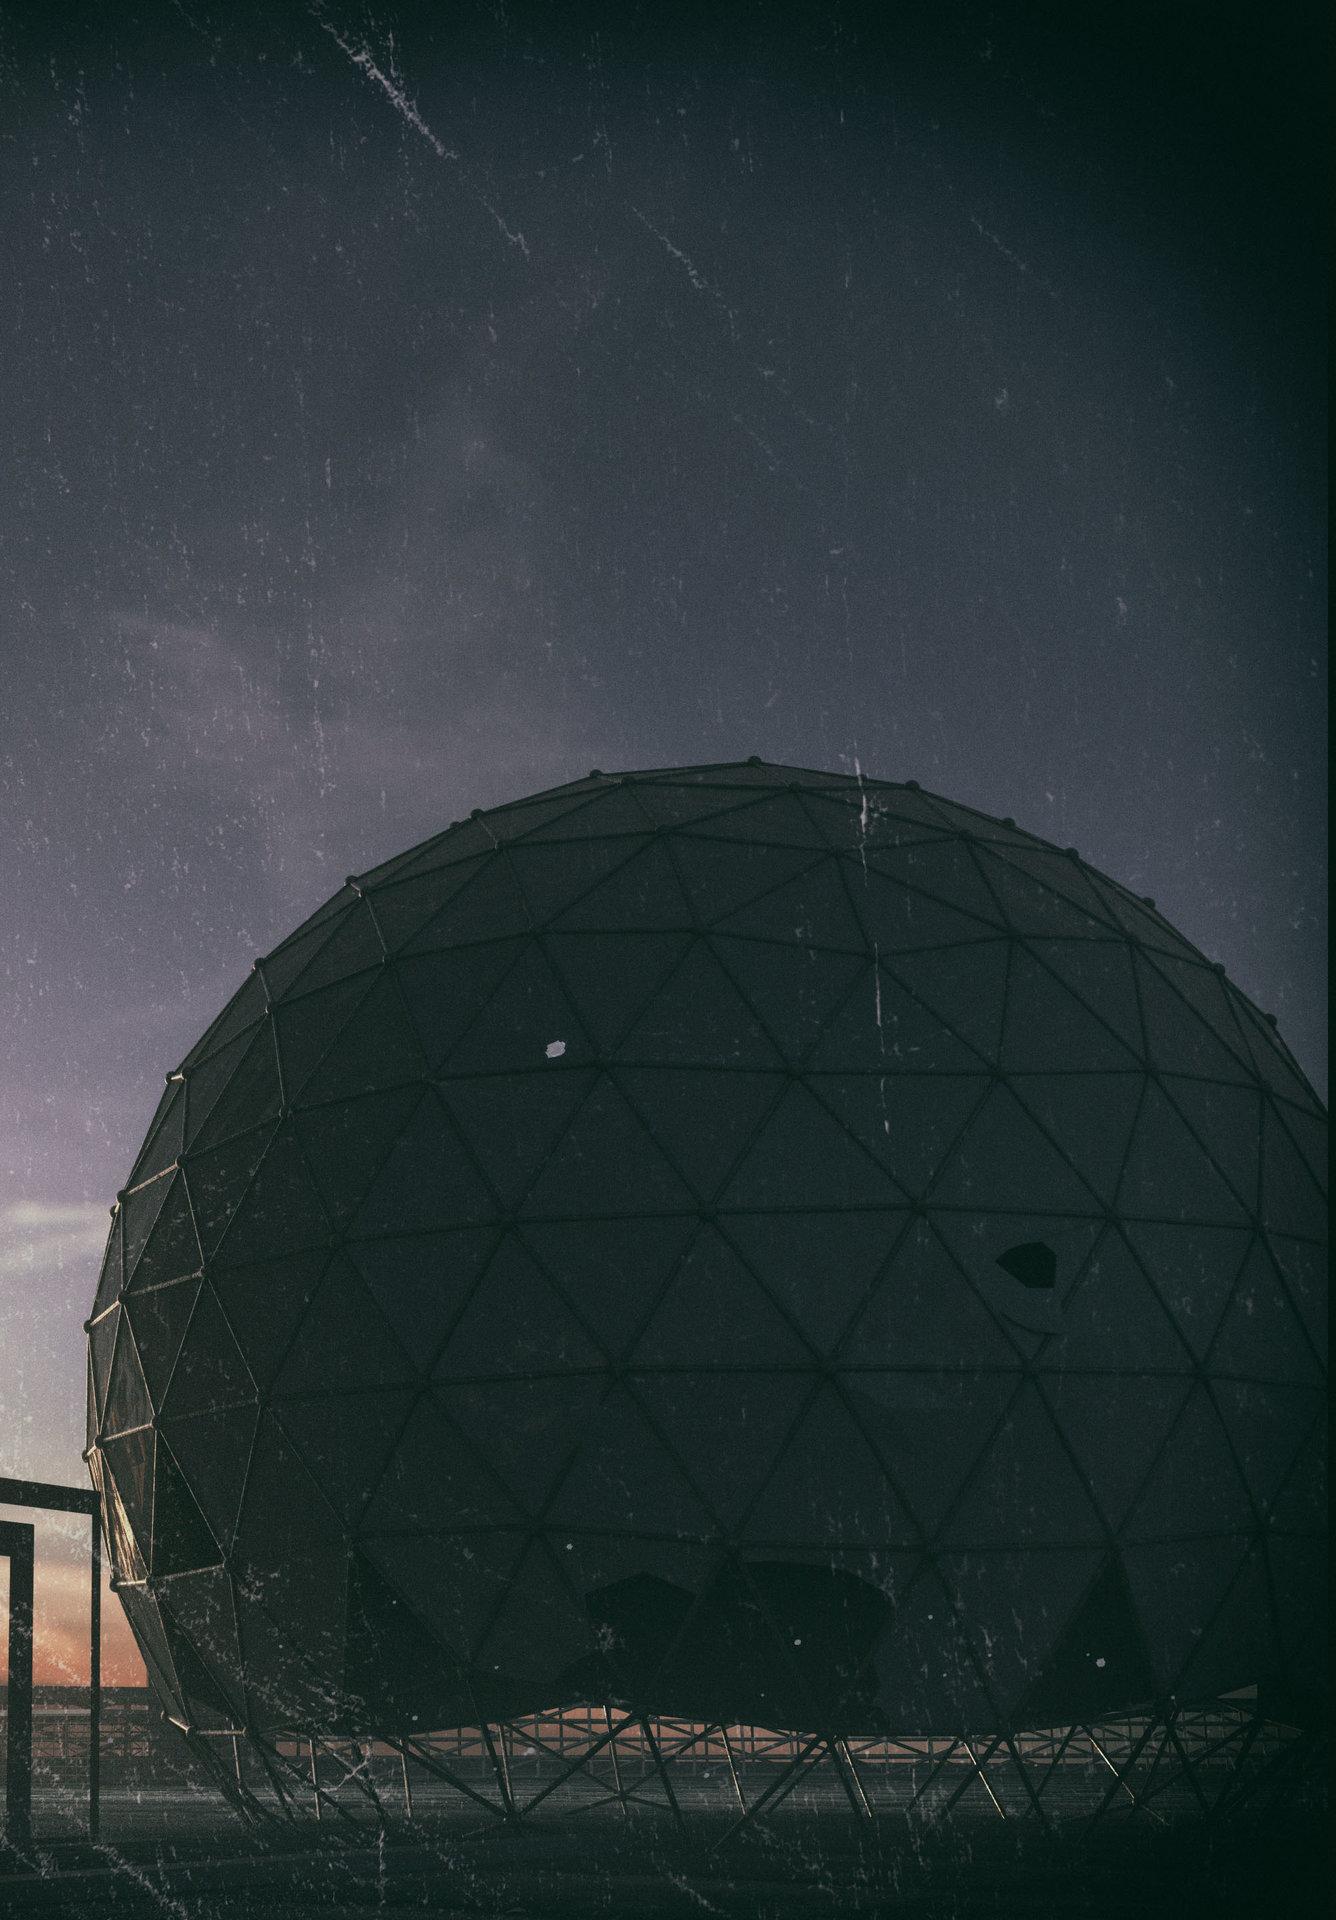 Kresimir jelusic geosphere apocalypse impression4 b